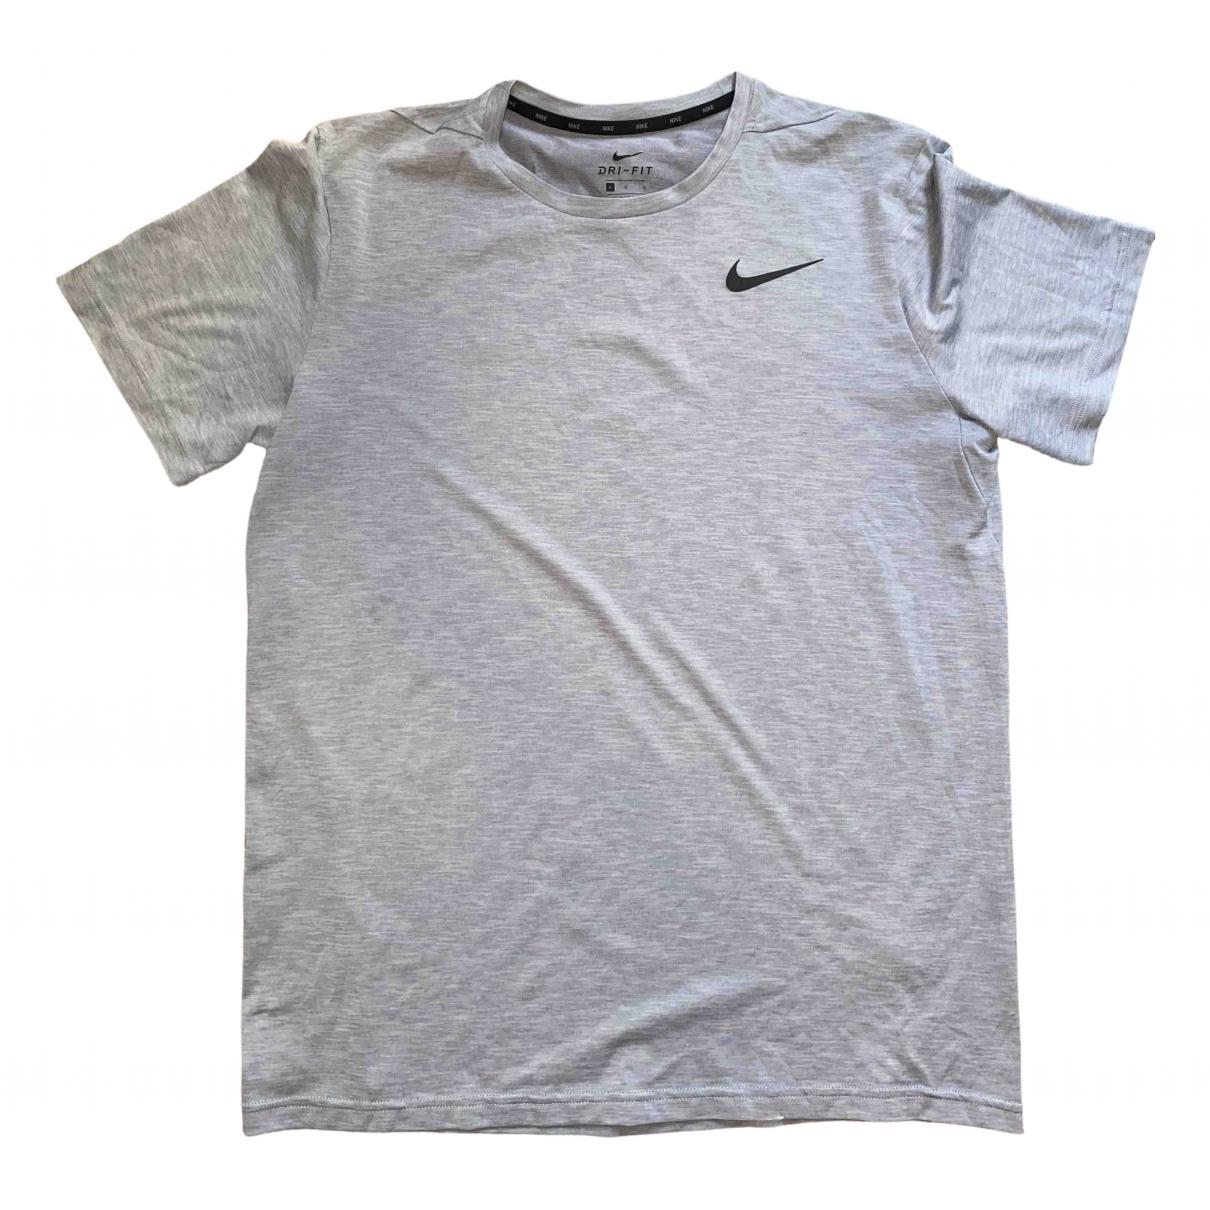 Nike - Tee shirts   pour homme en lycra - gris